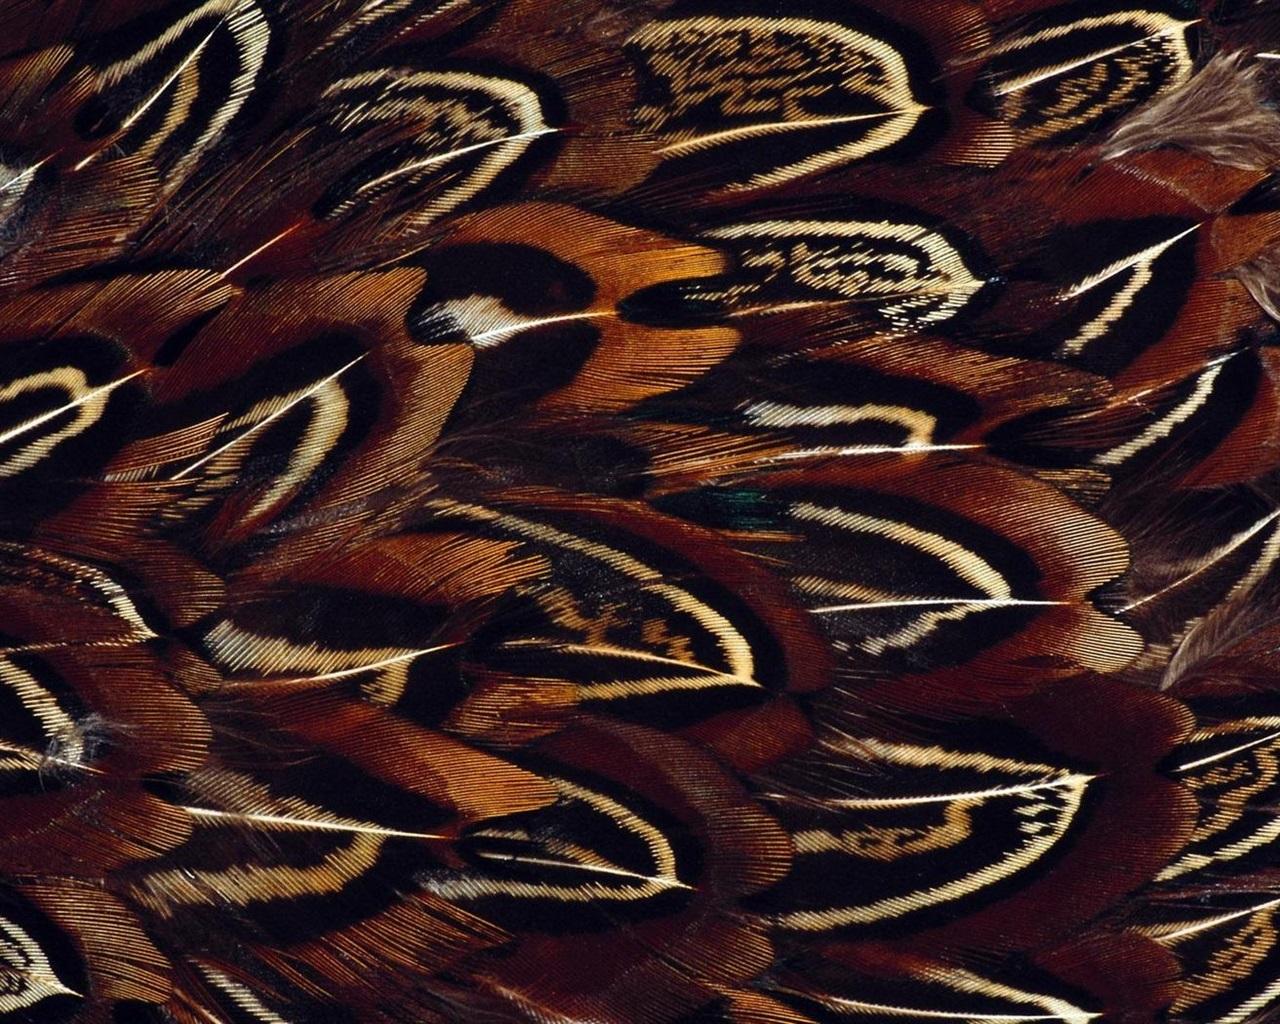 Bird Feathers Macro Photography Wallpaper